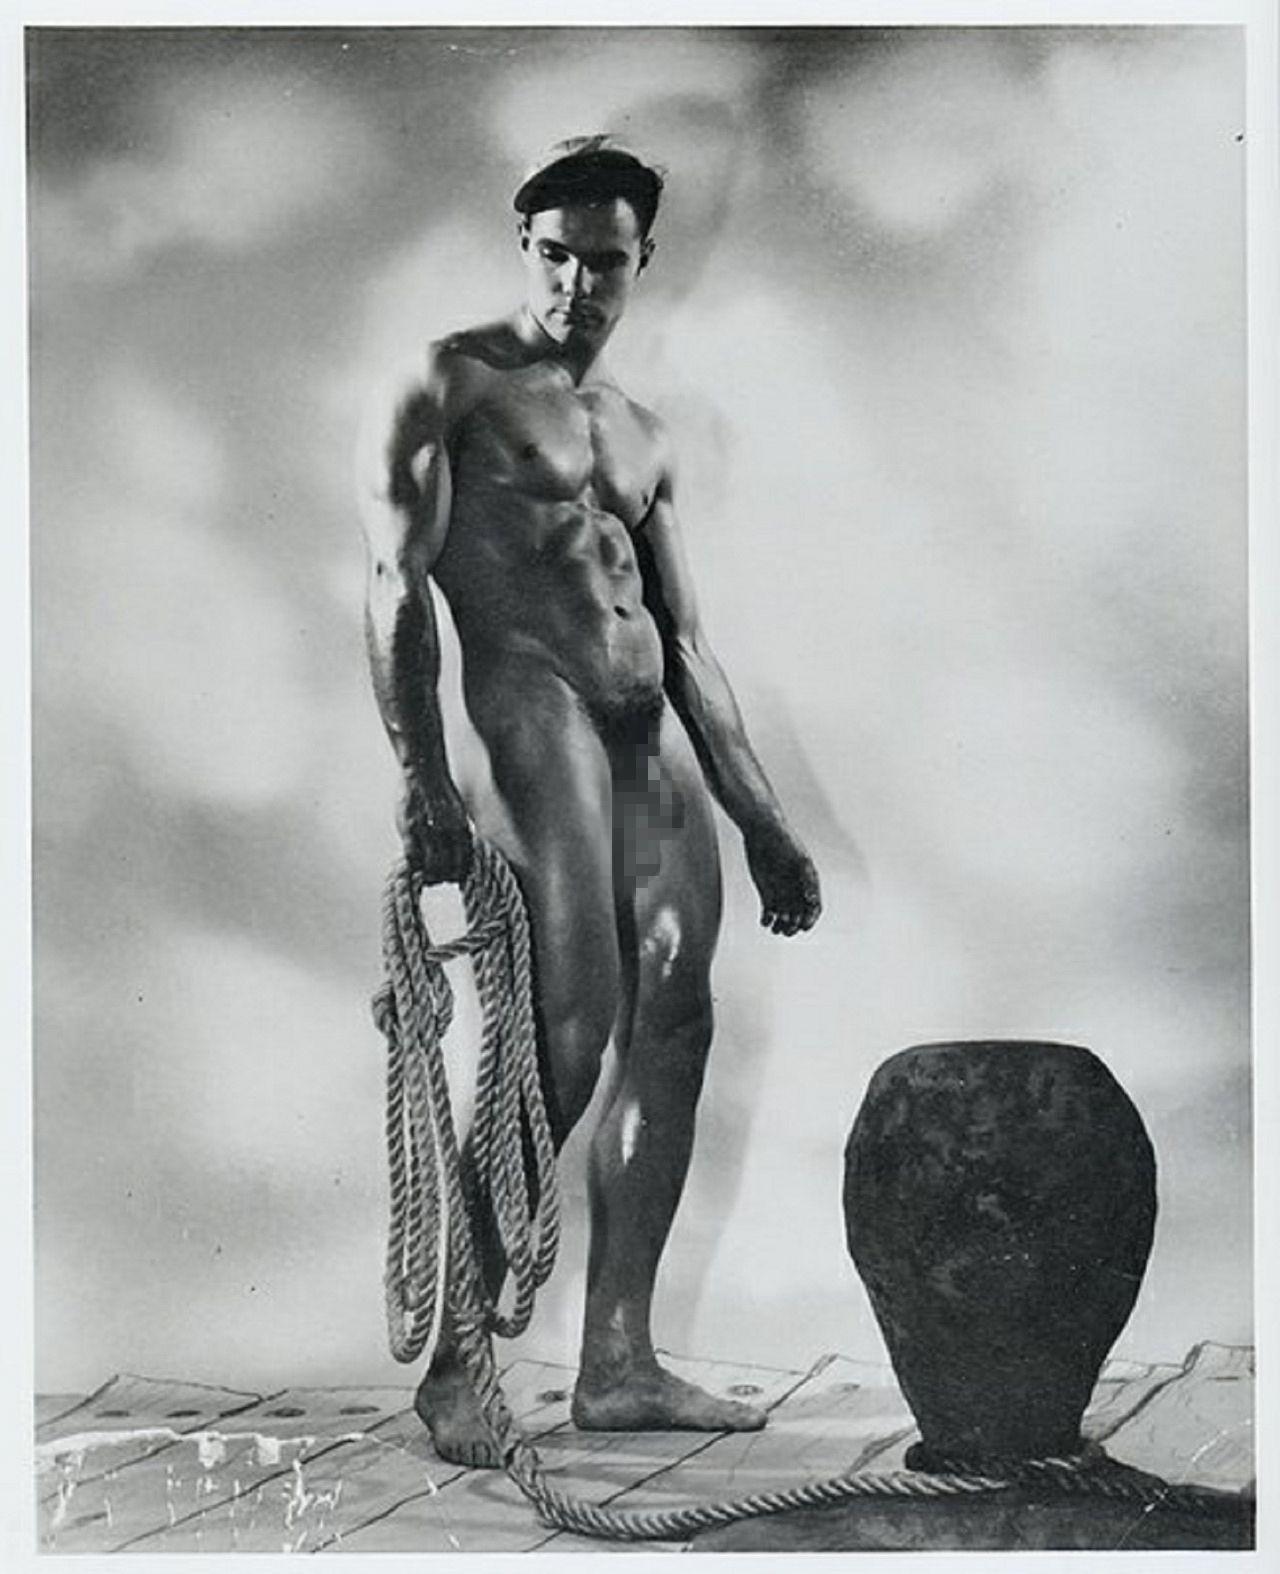 Art Ullrich   Beefcake: Vintage Bodybuilders, Vintage Bodybuilding ... for Bodybuilding Art Photography  59dqh